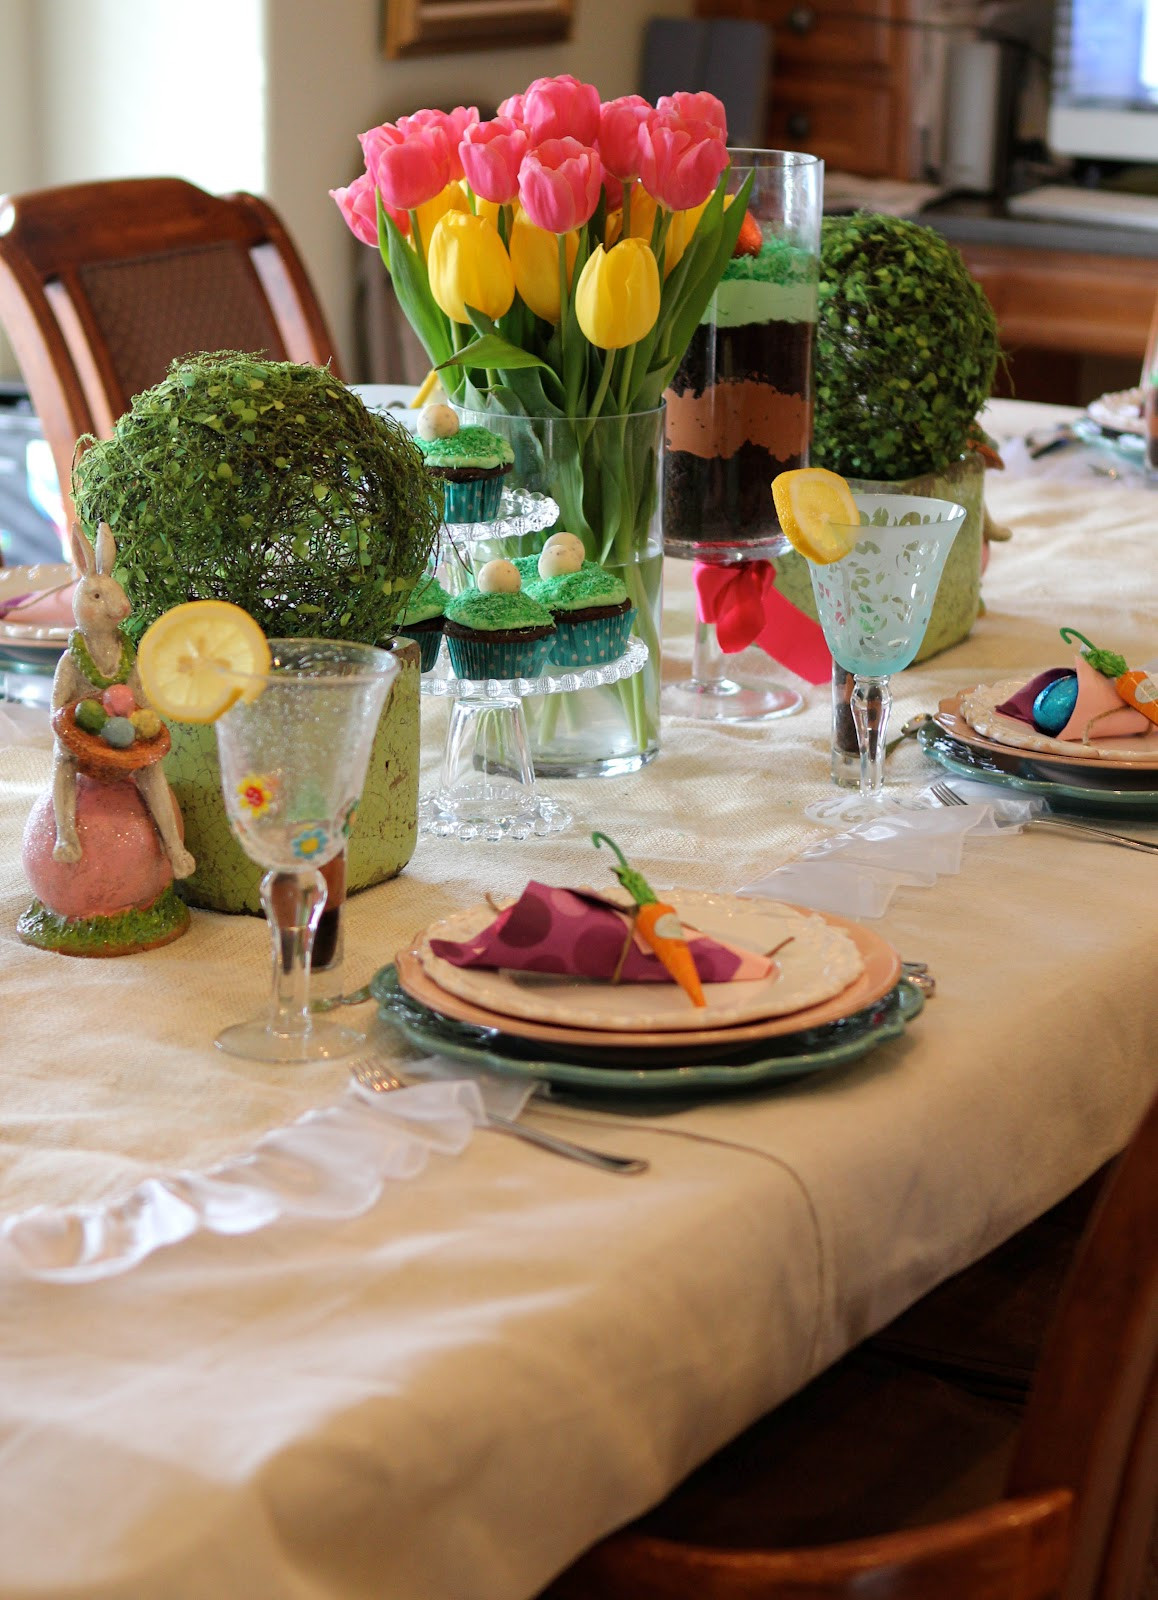 Easter Dinner For One  A Little Cuppa Tea Easter Dinner